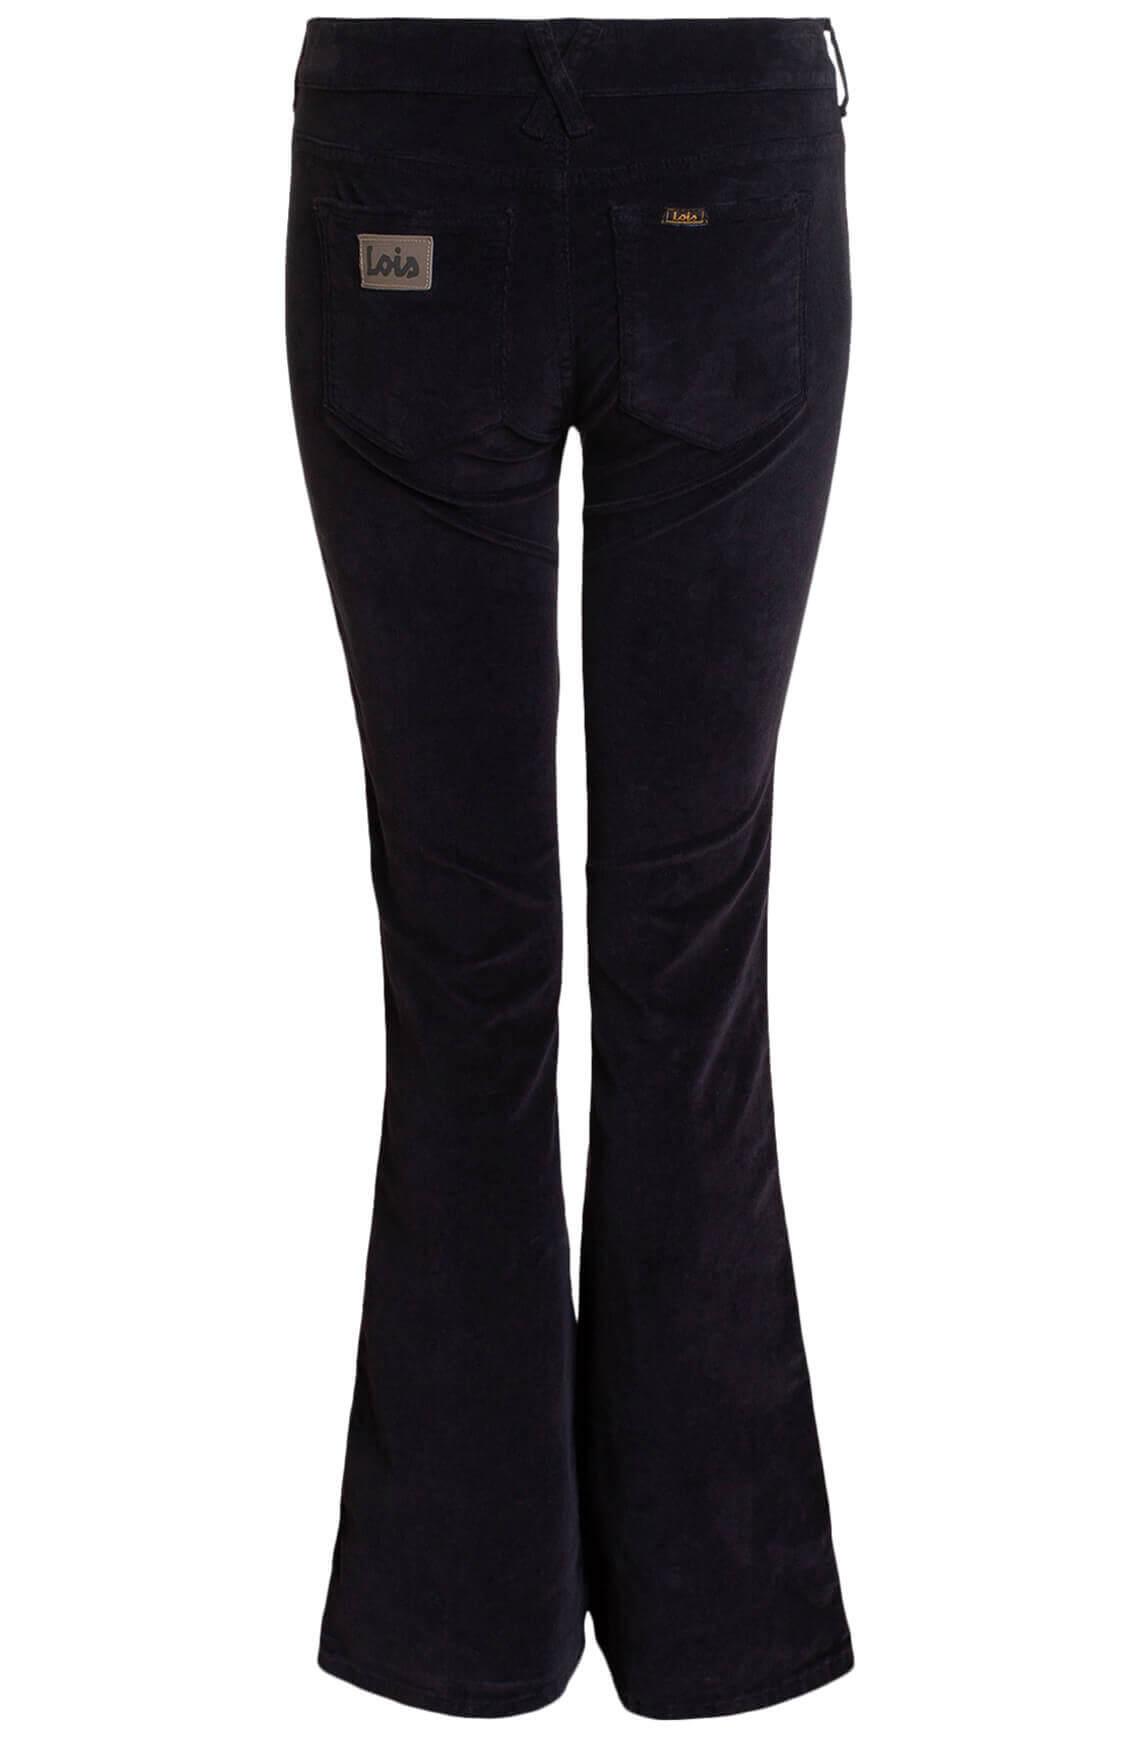 Lois Dames L32 Yoko broek zwart